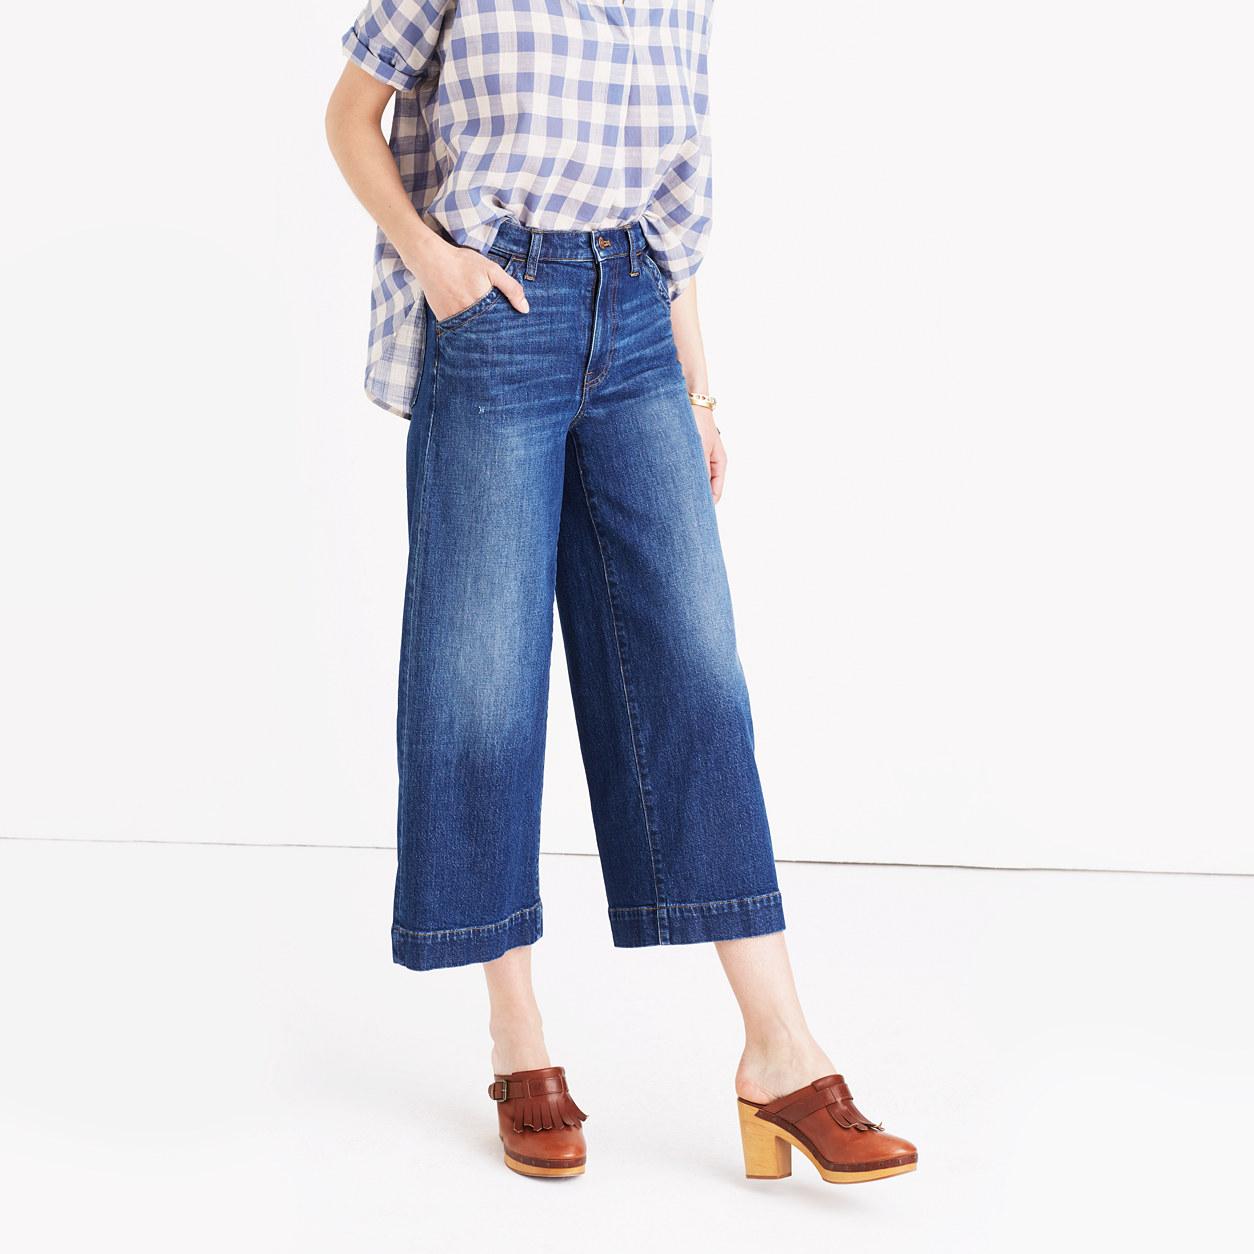 Wide-Leg Crop Jeans in Colvin Wash : demi-boots & wide-leg jeans ...